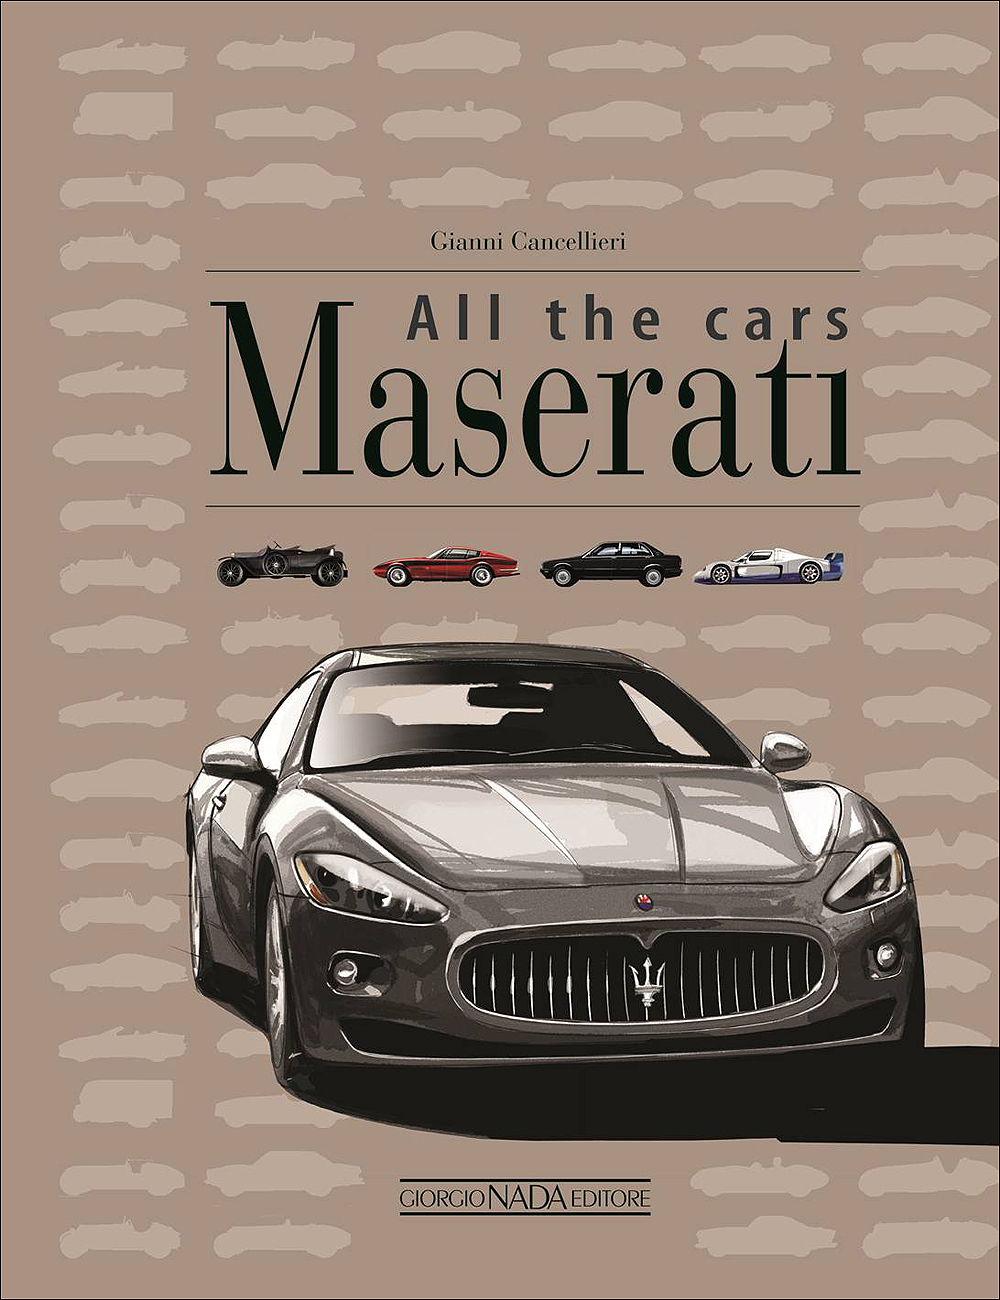 Maserati. All the cars